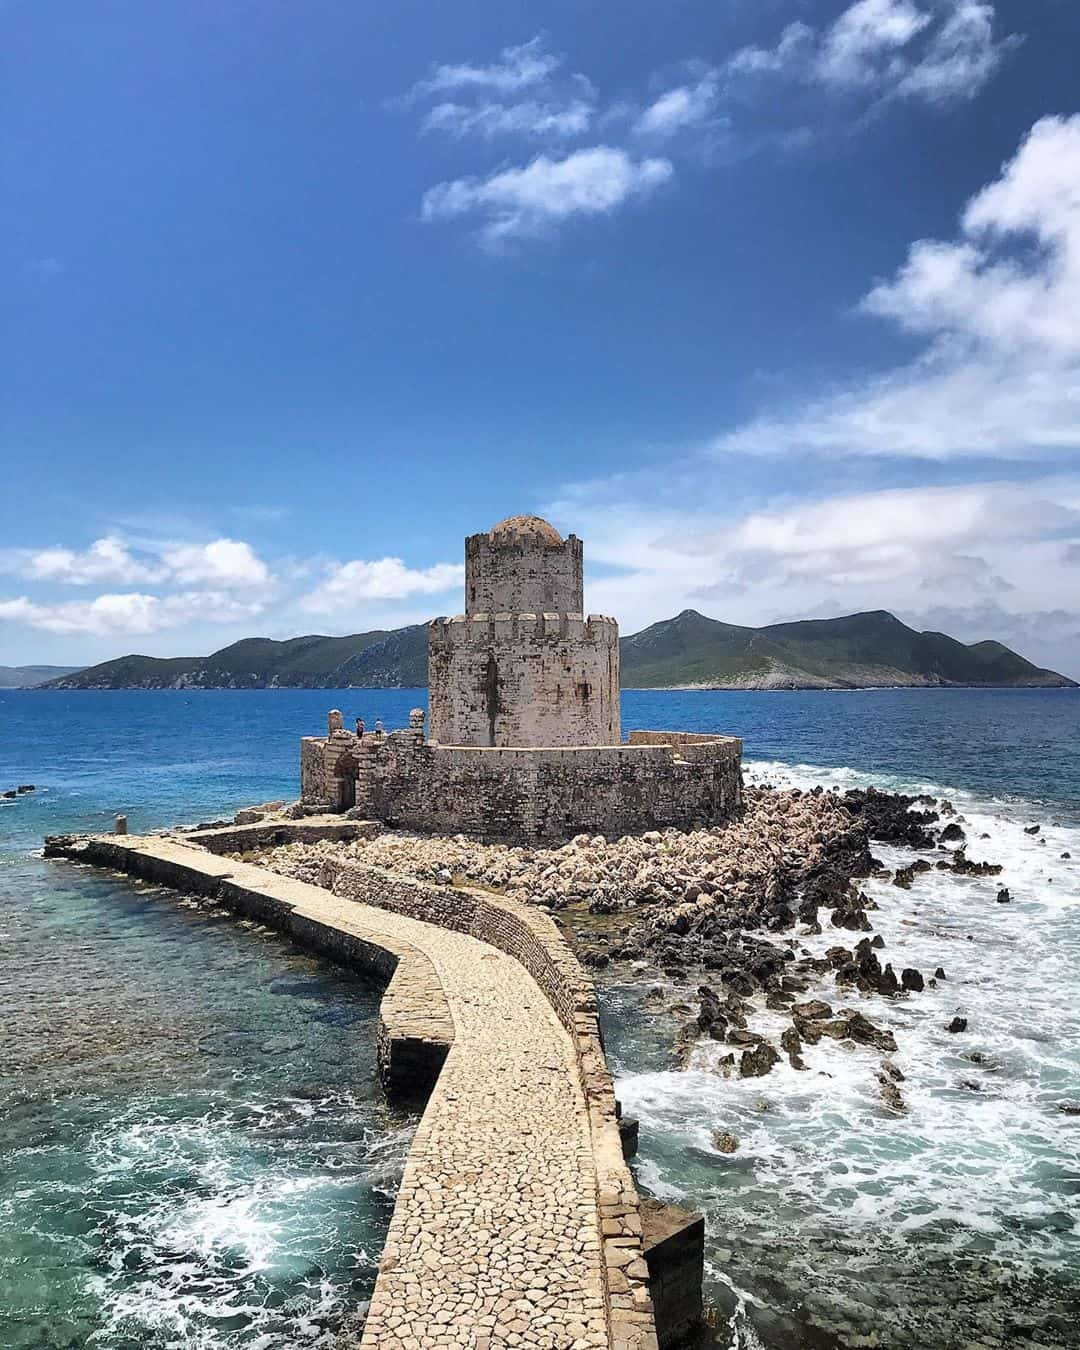 Methoni, Peloponnese